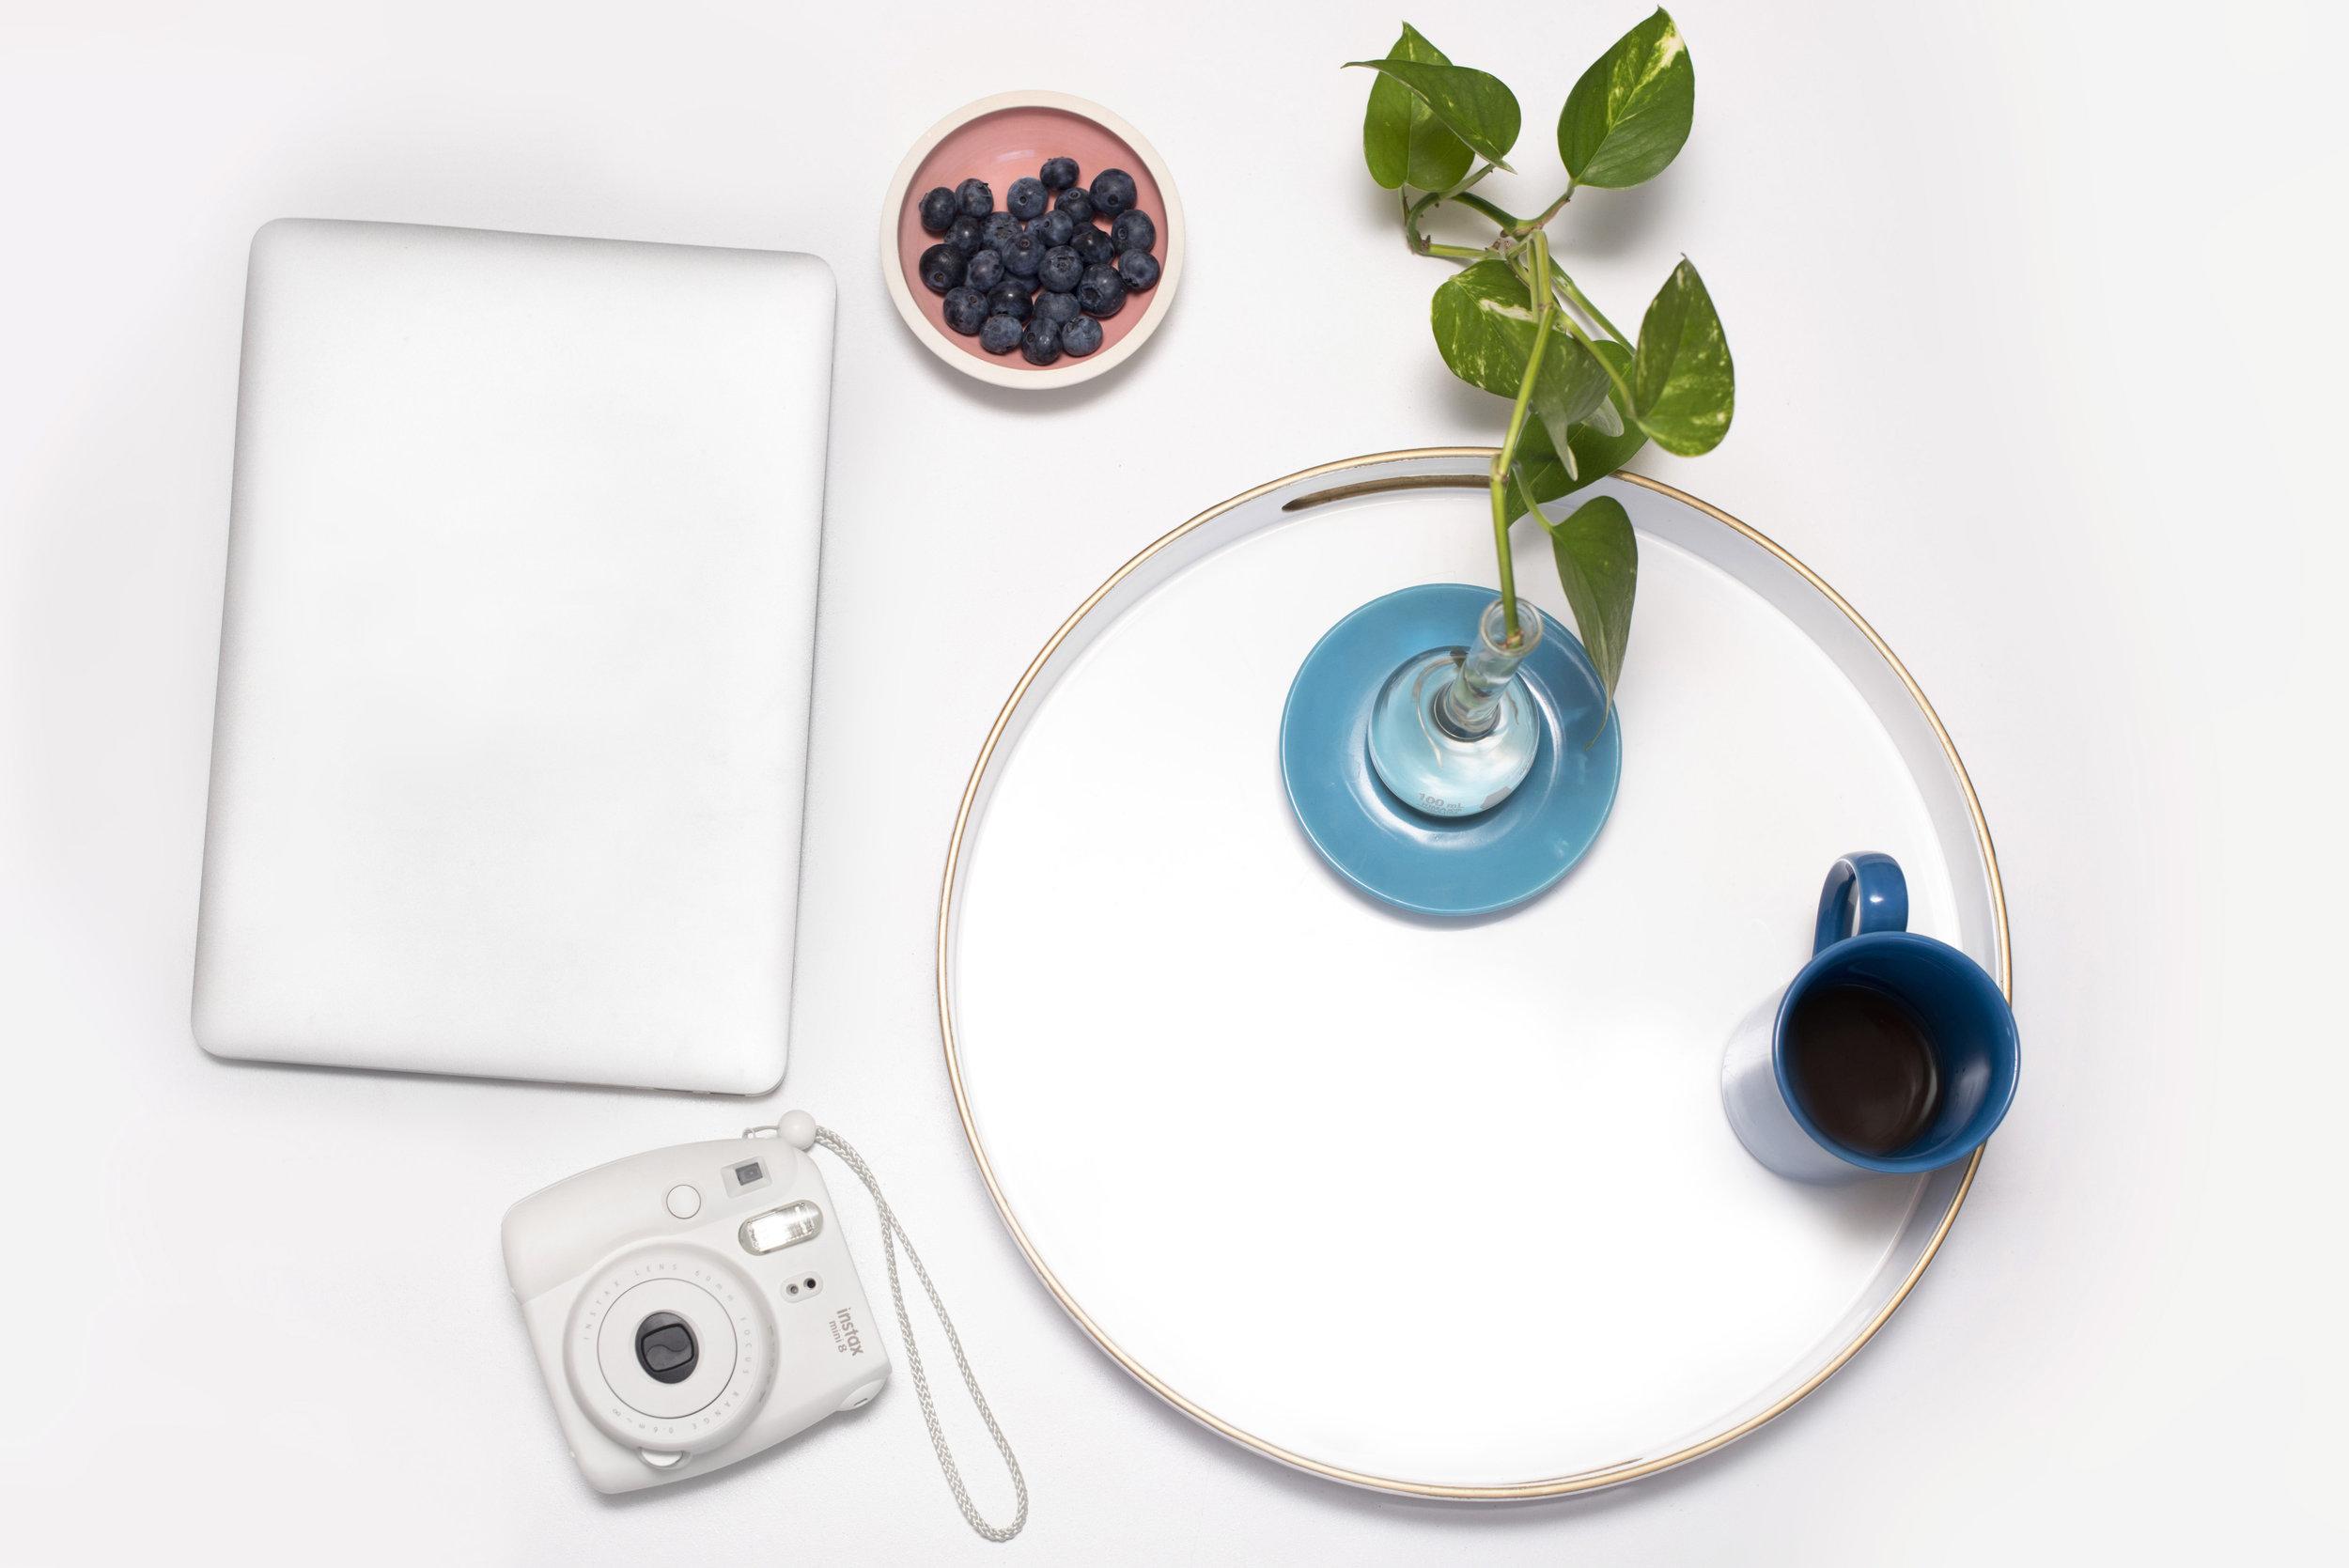 laptop-camera-plant-blueberries.jpg